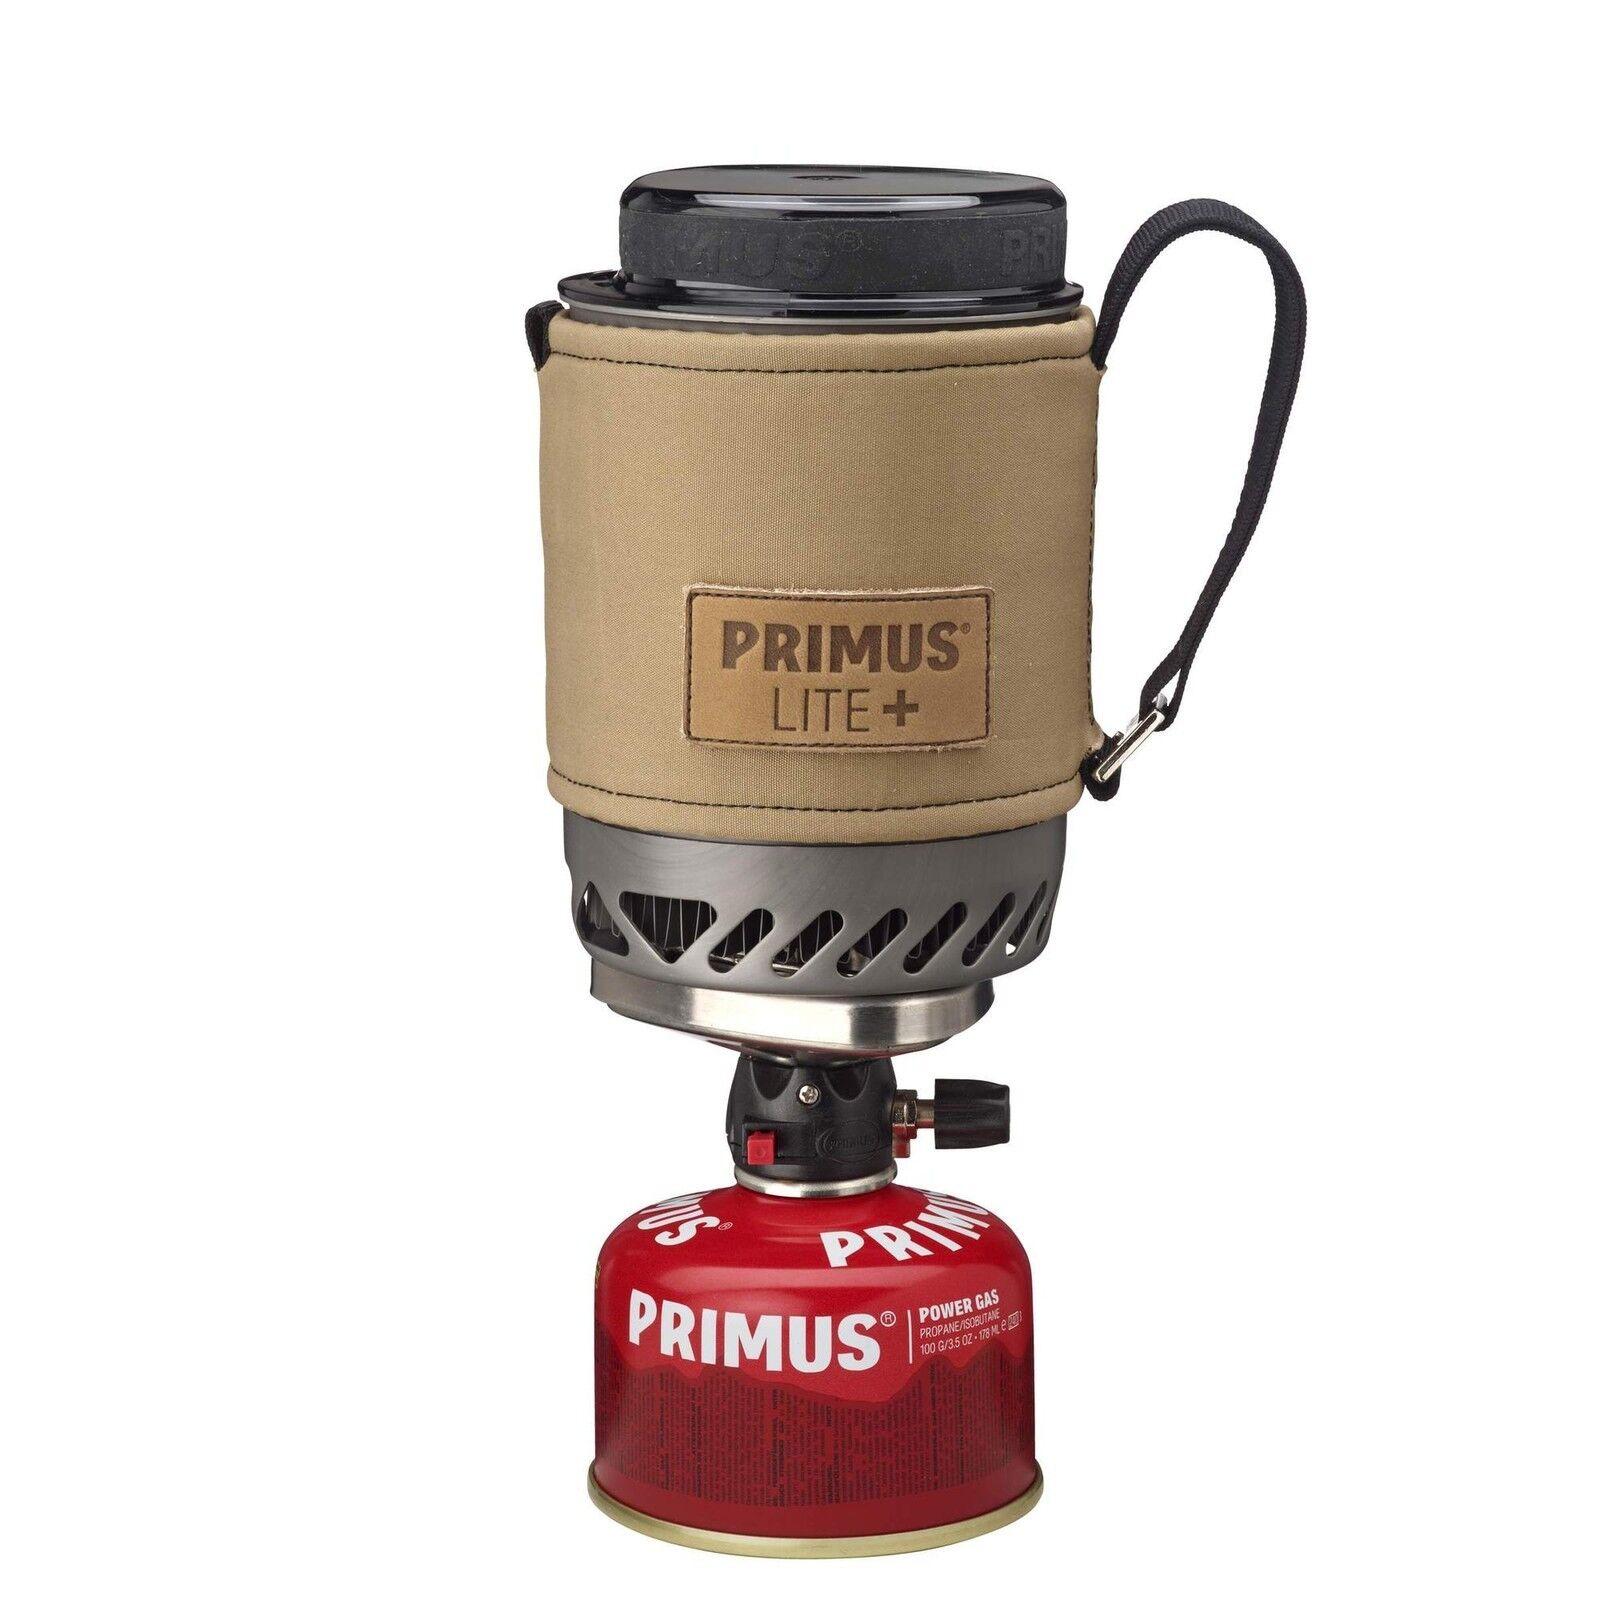 PRIMUS Lite Plus Trekkingkocher, sand P356009